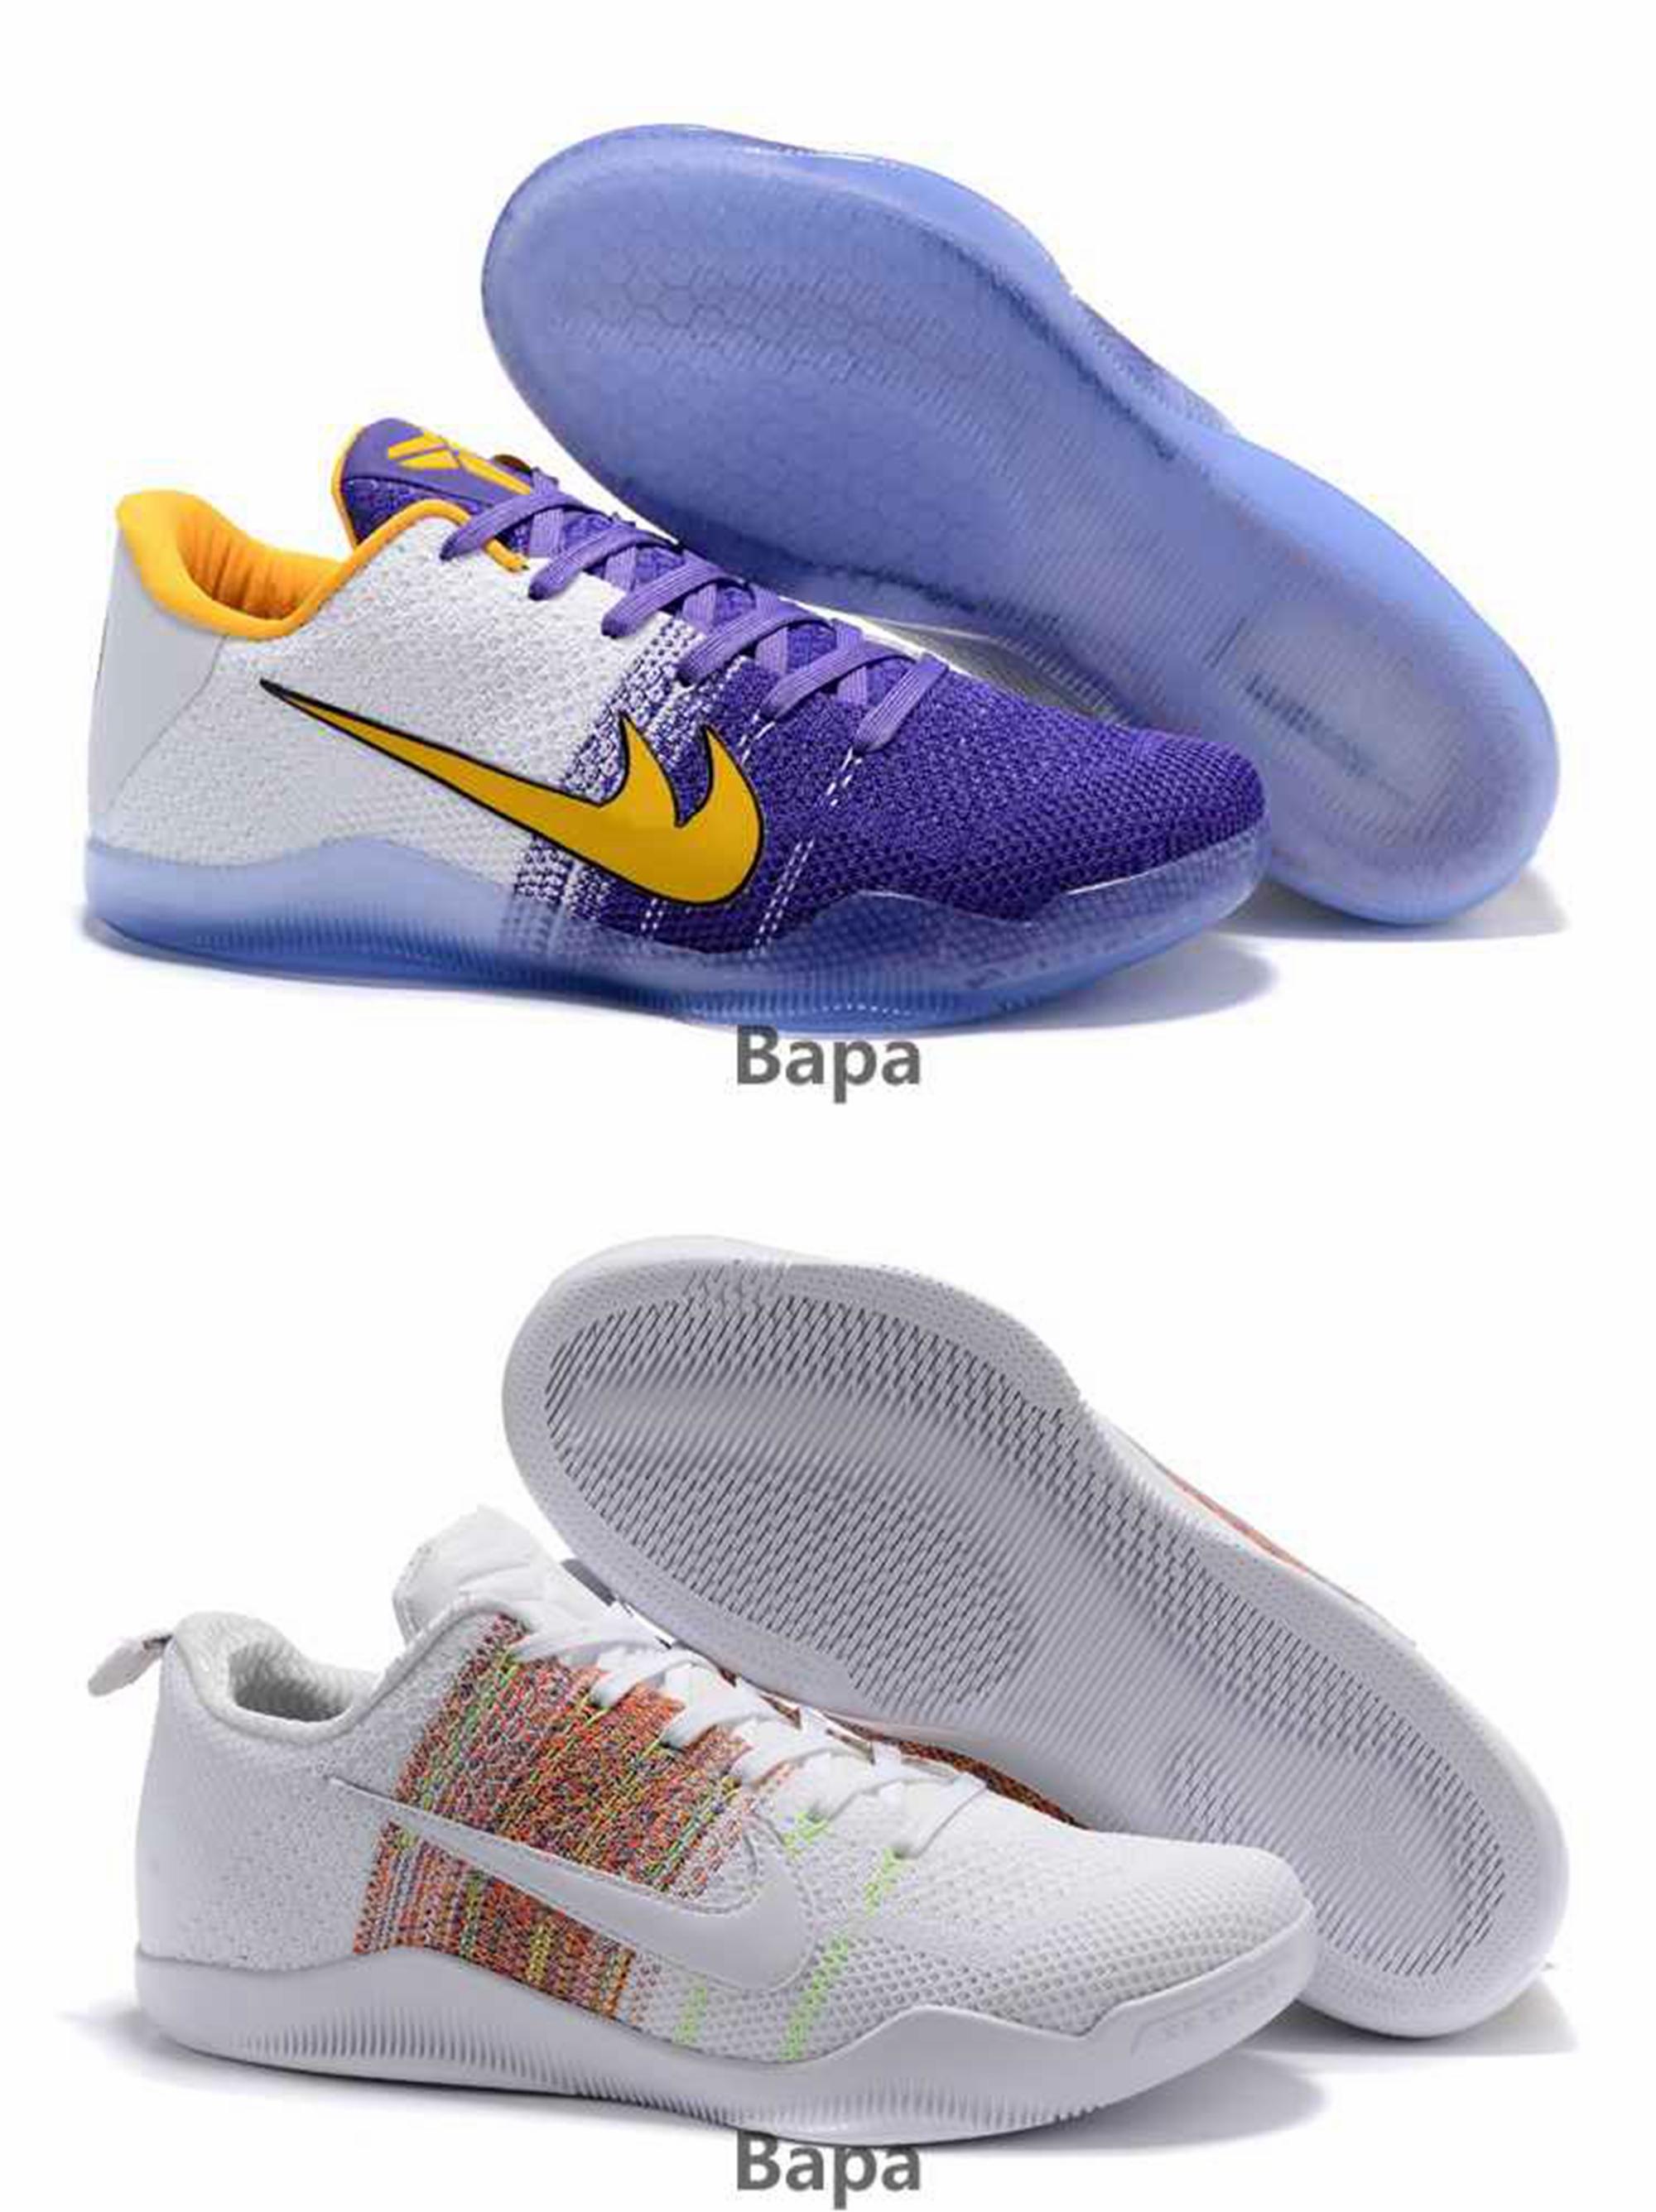 Kobe 11 Low Cut 2015 New Basketball Sh...